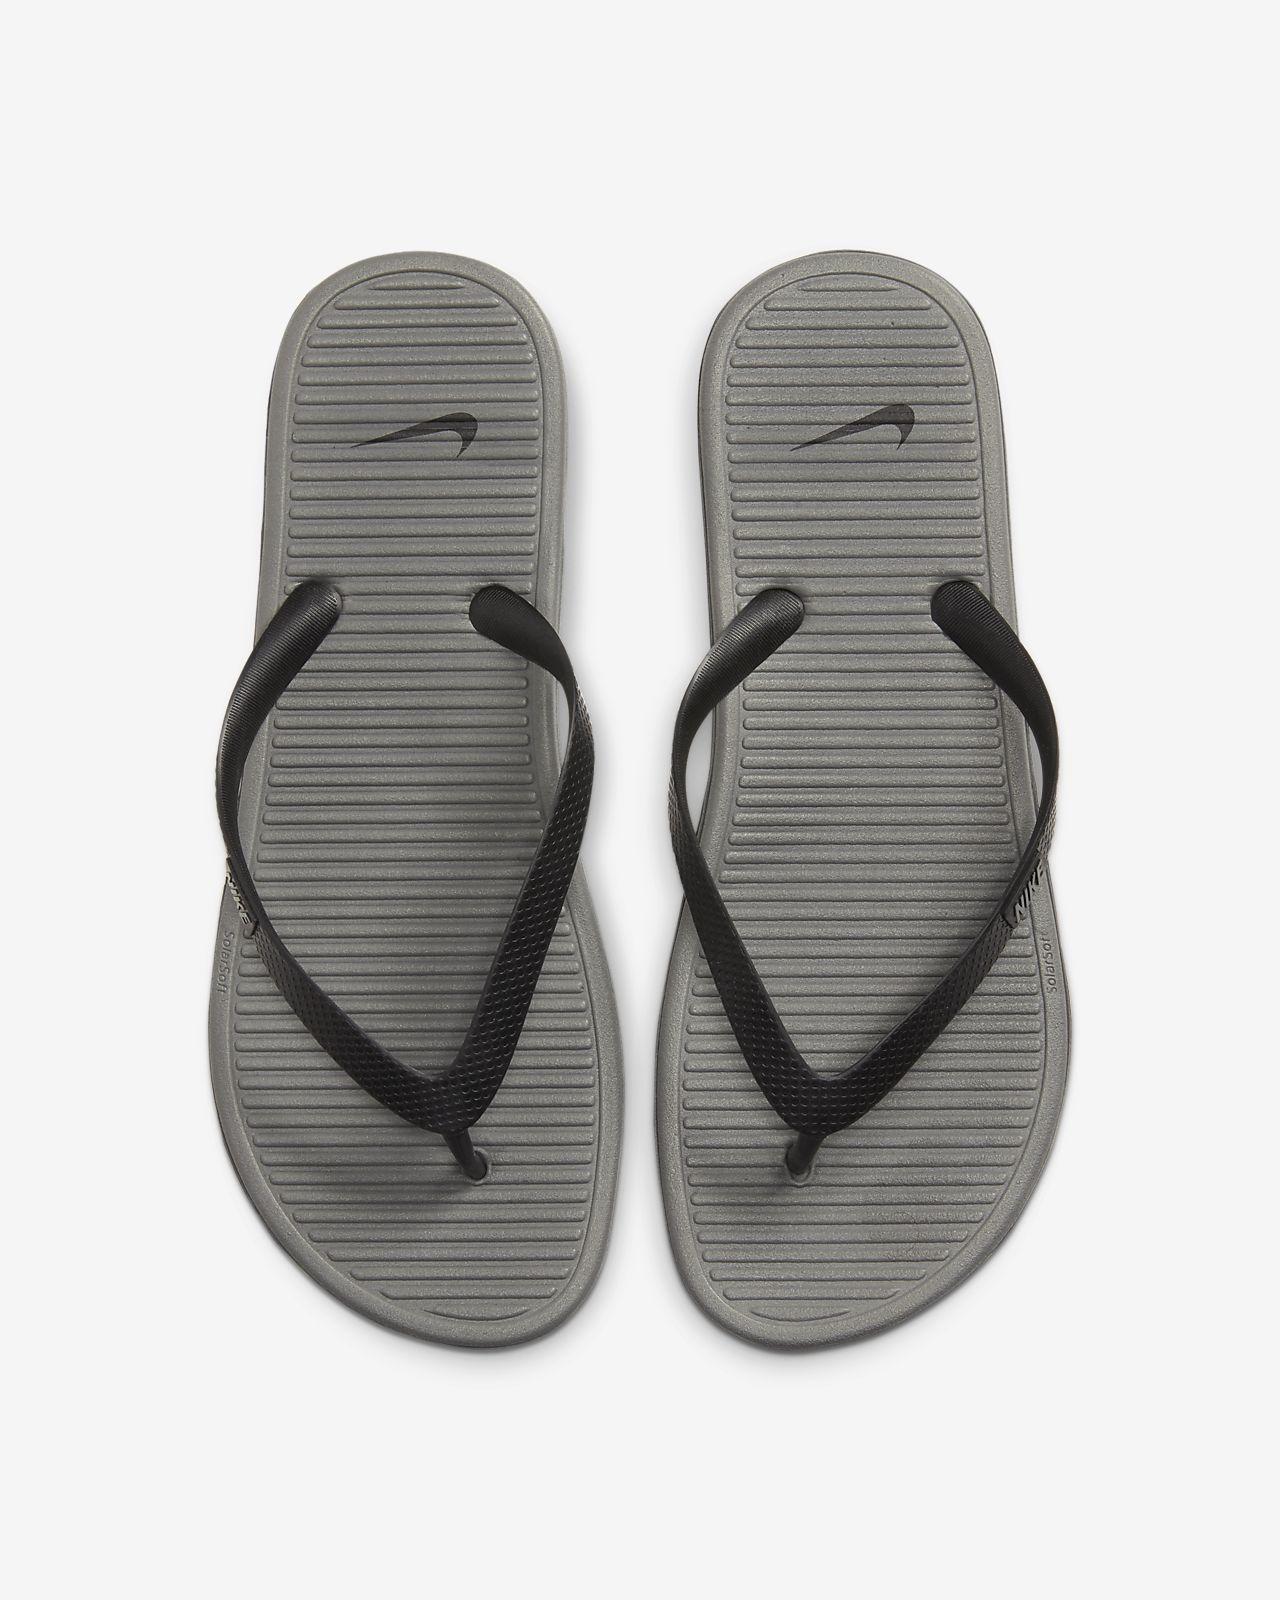 Nike Solarsoft Thong2男子拖鞋